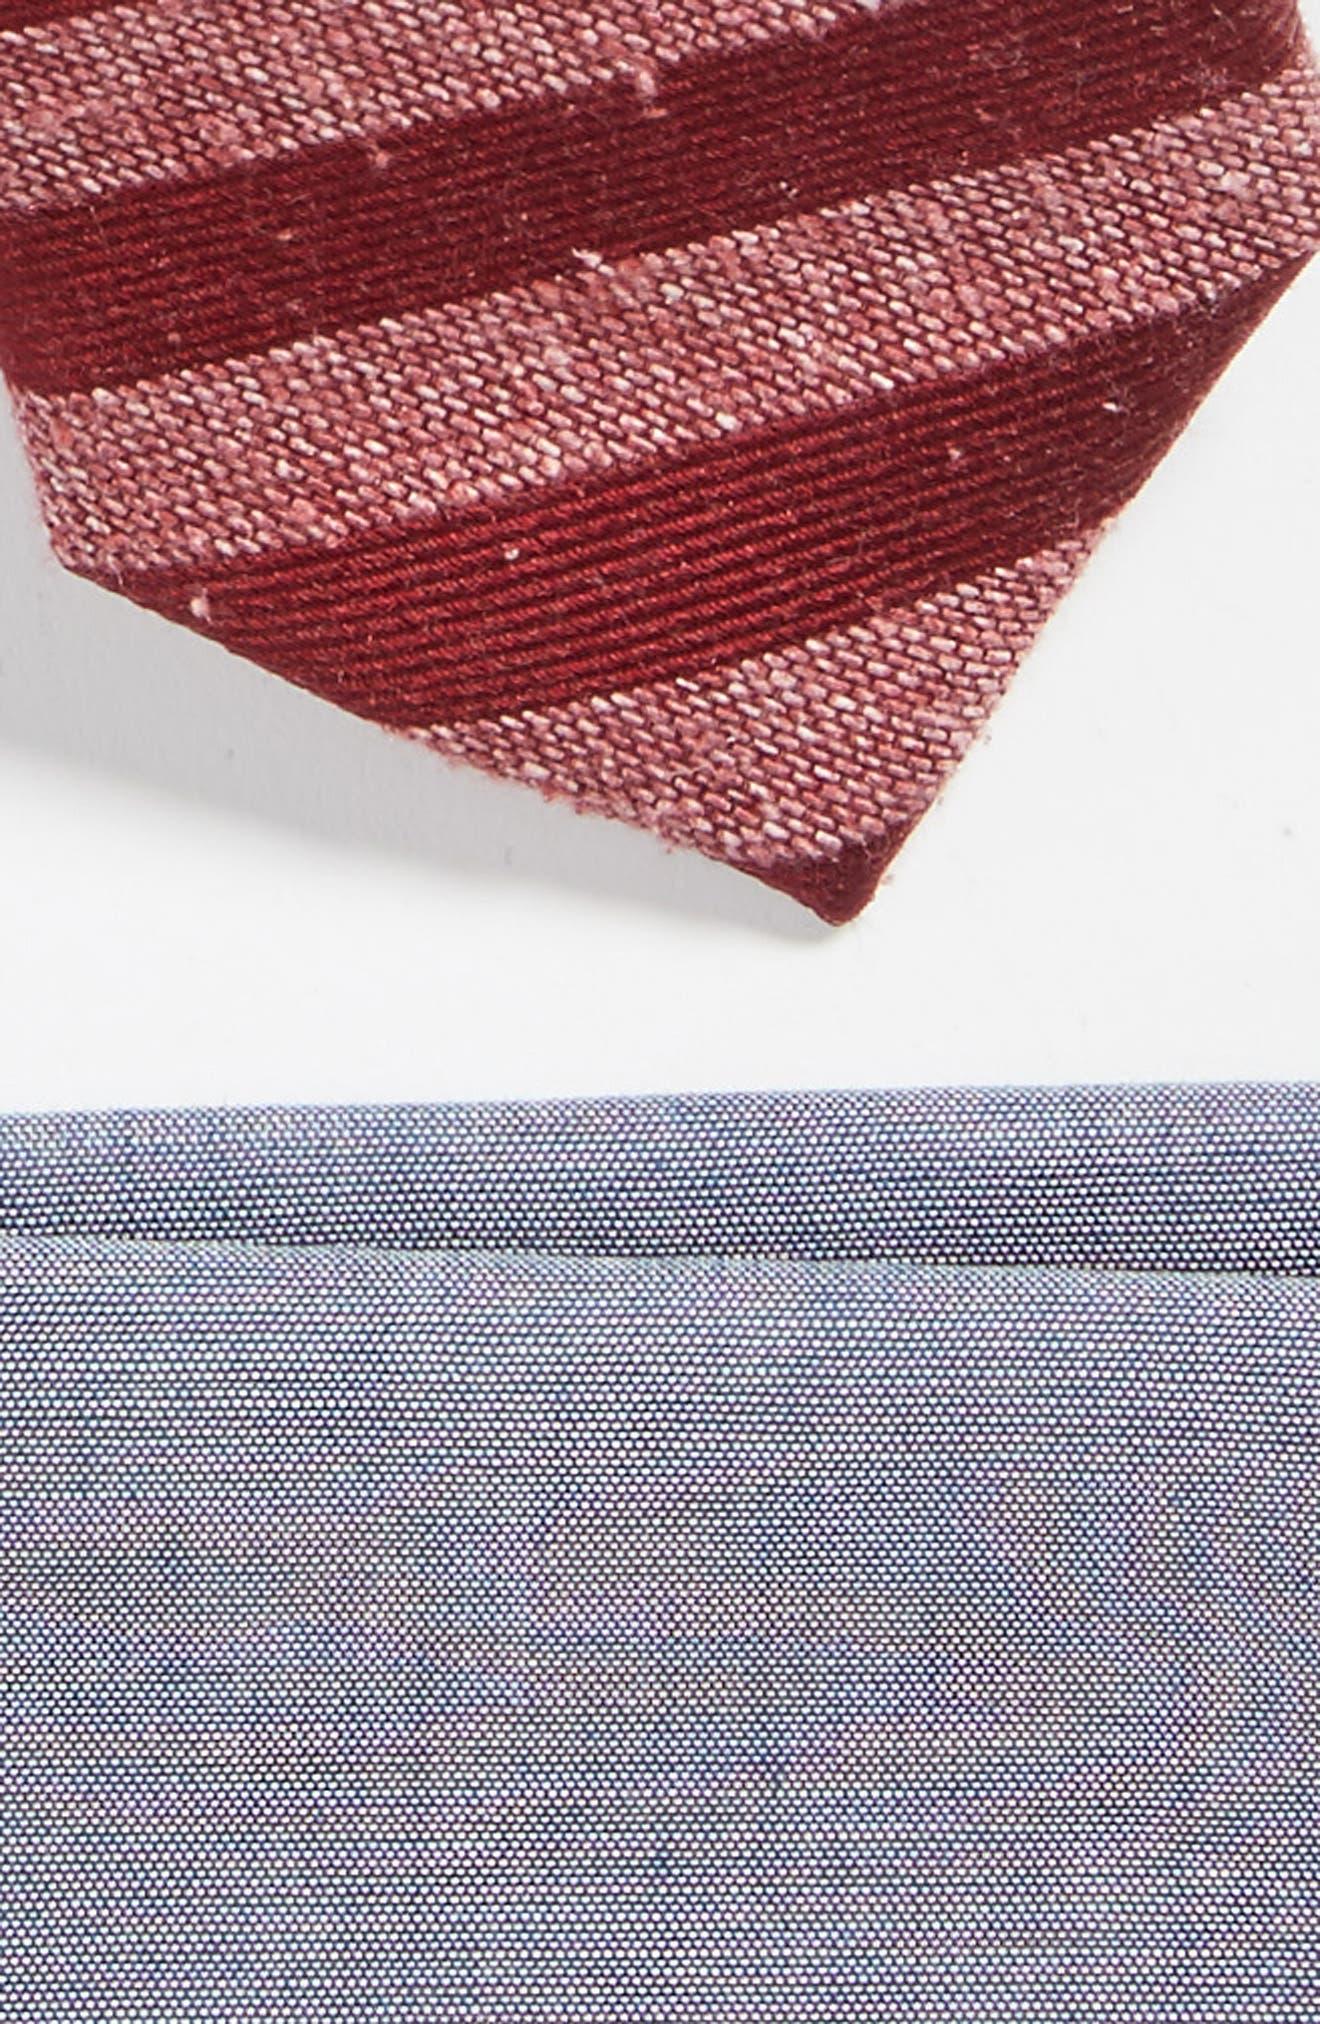 Alternate Image 2  - The Tie Bar Meter Stripe Tie & Pocket Square Box Set